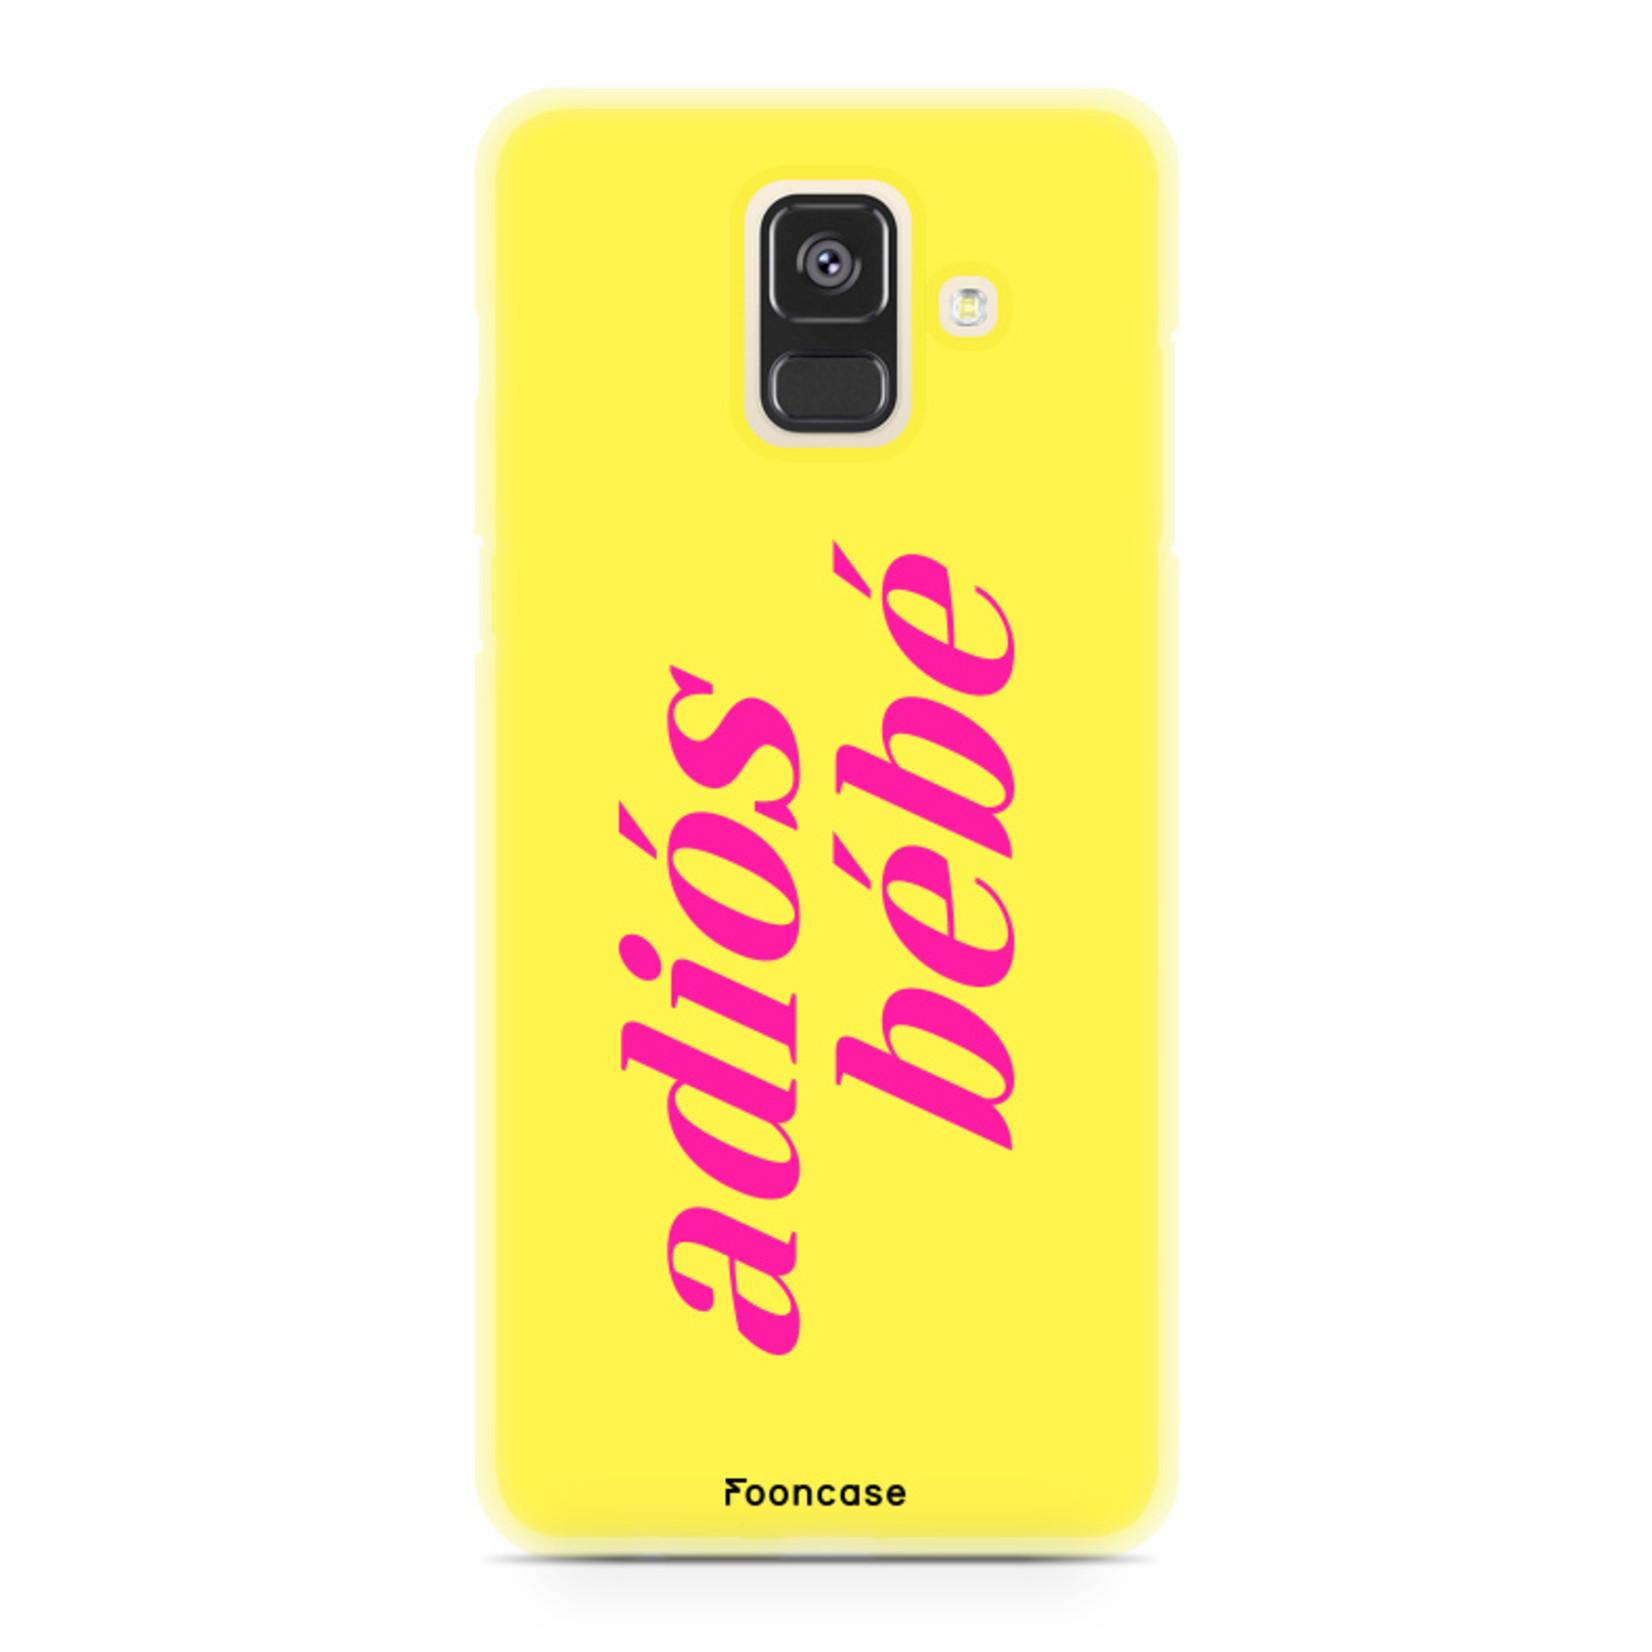 FOONCASE Samsung Galaxy A6 2018 Handyhülle - Adiós Bébé ☀